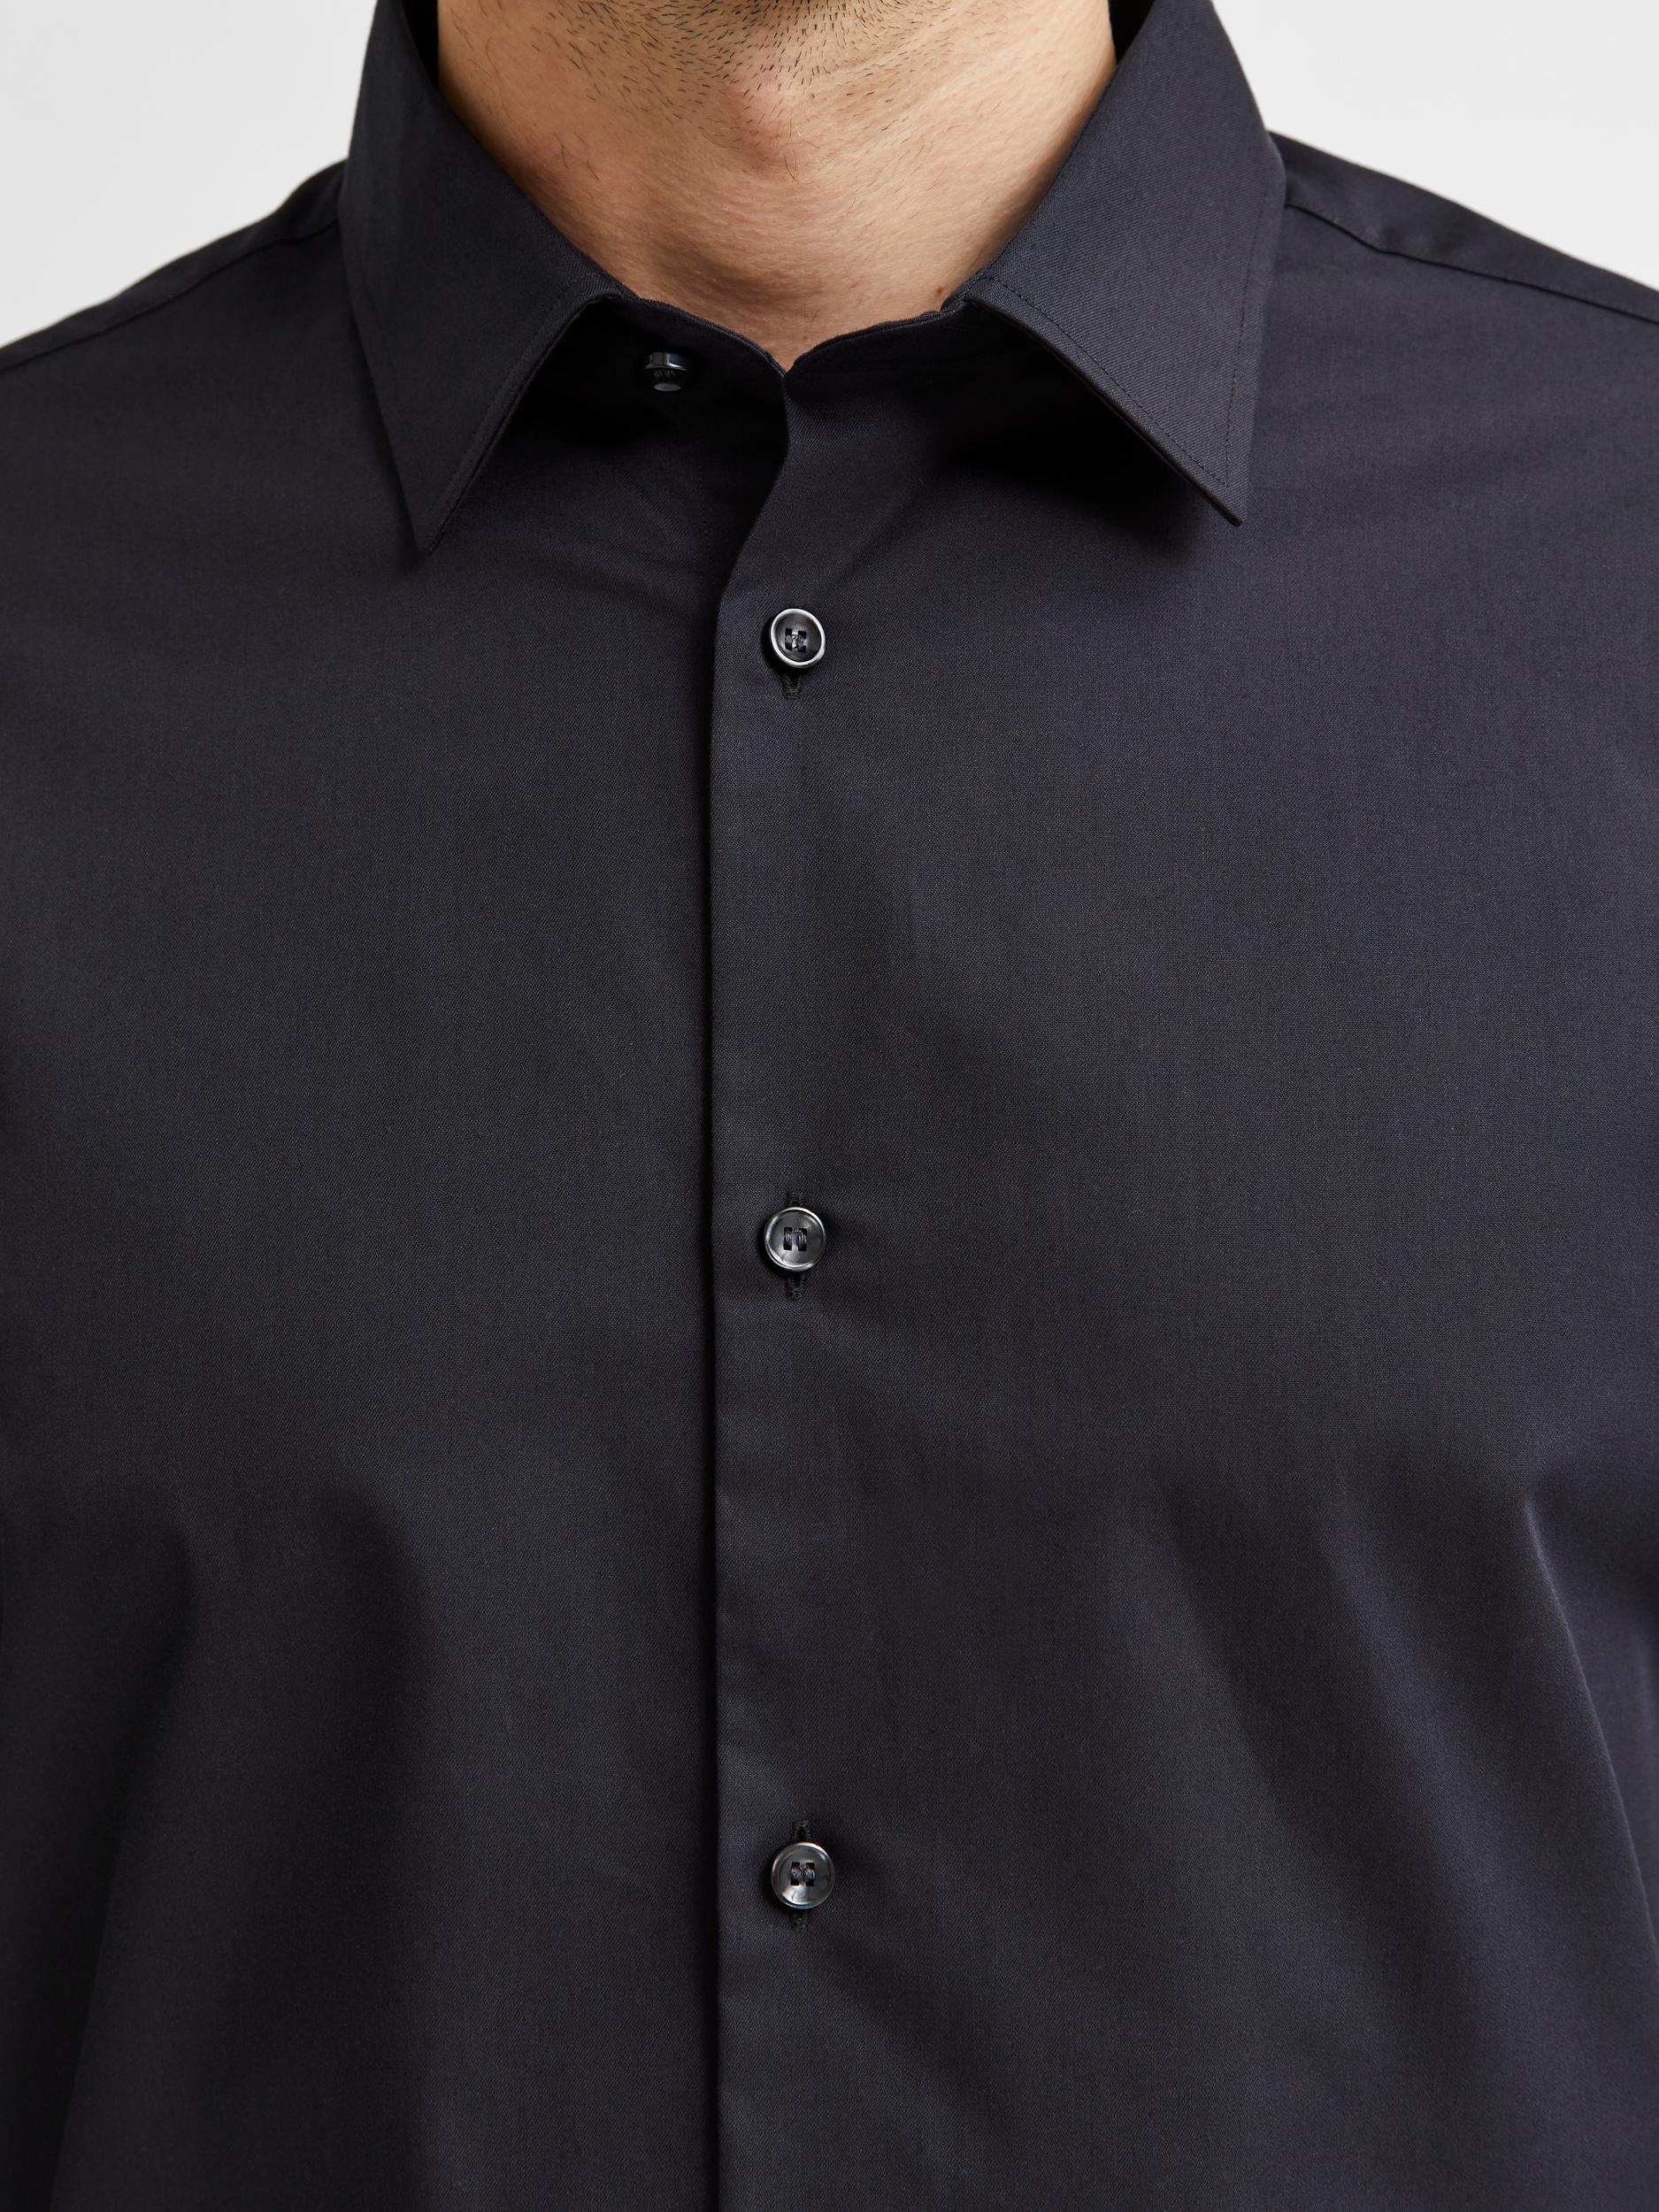 Selected Homme Slim Ethan skjorte, black, medium